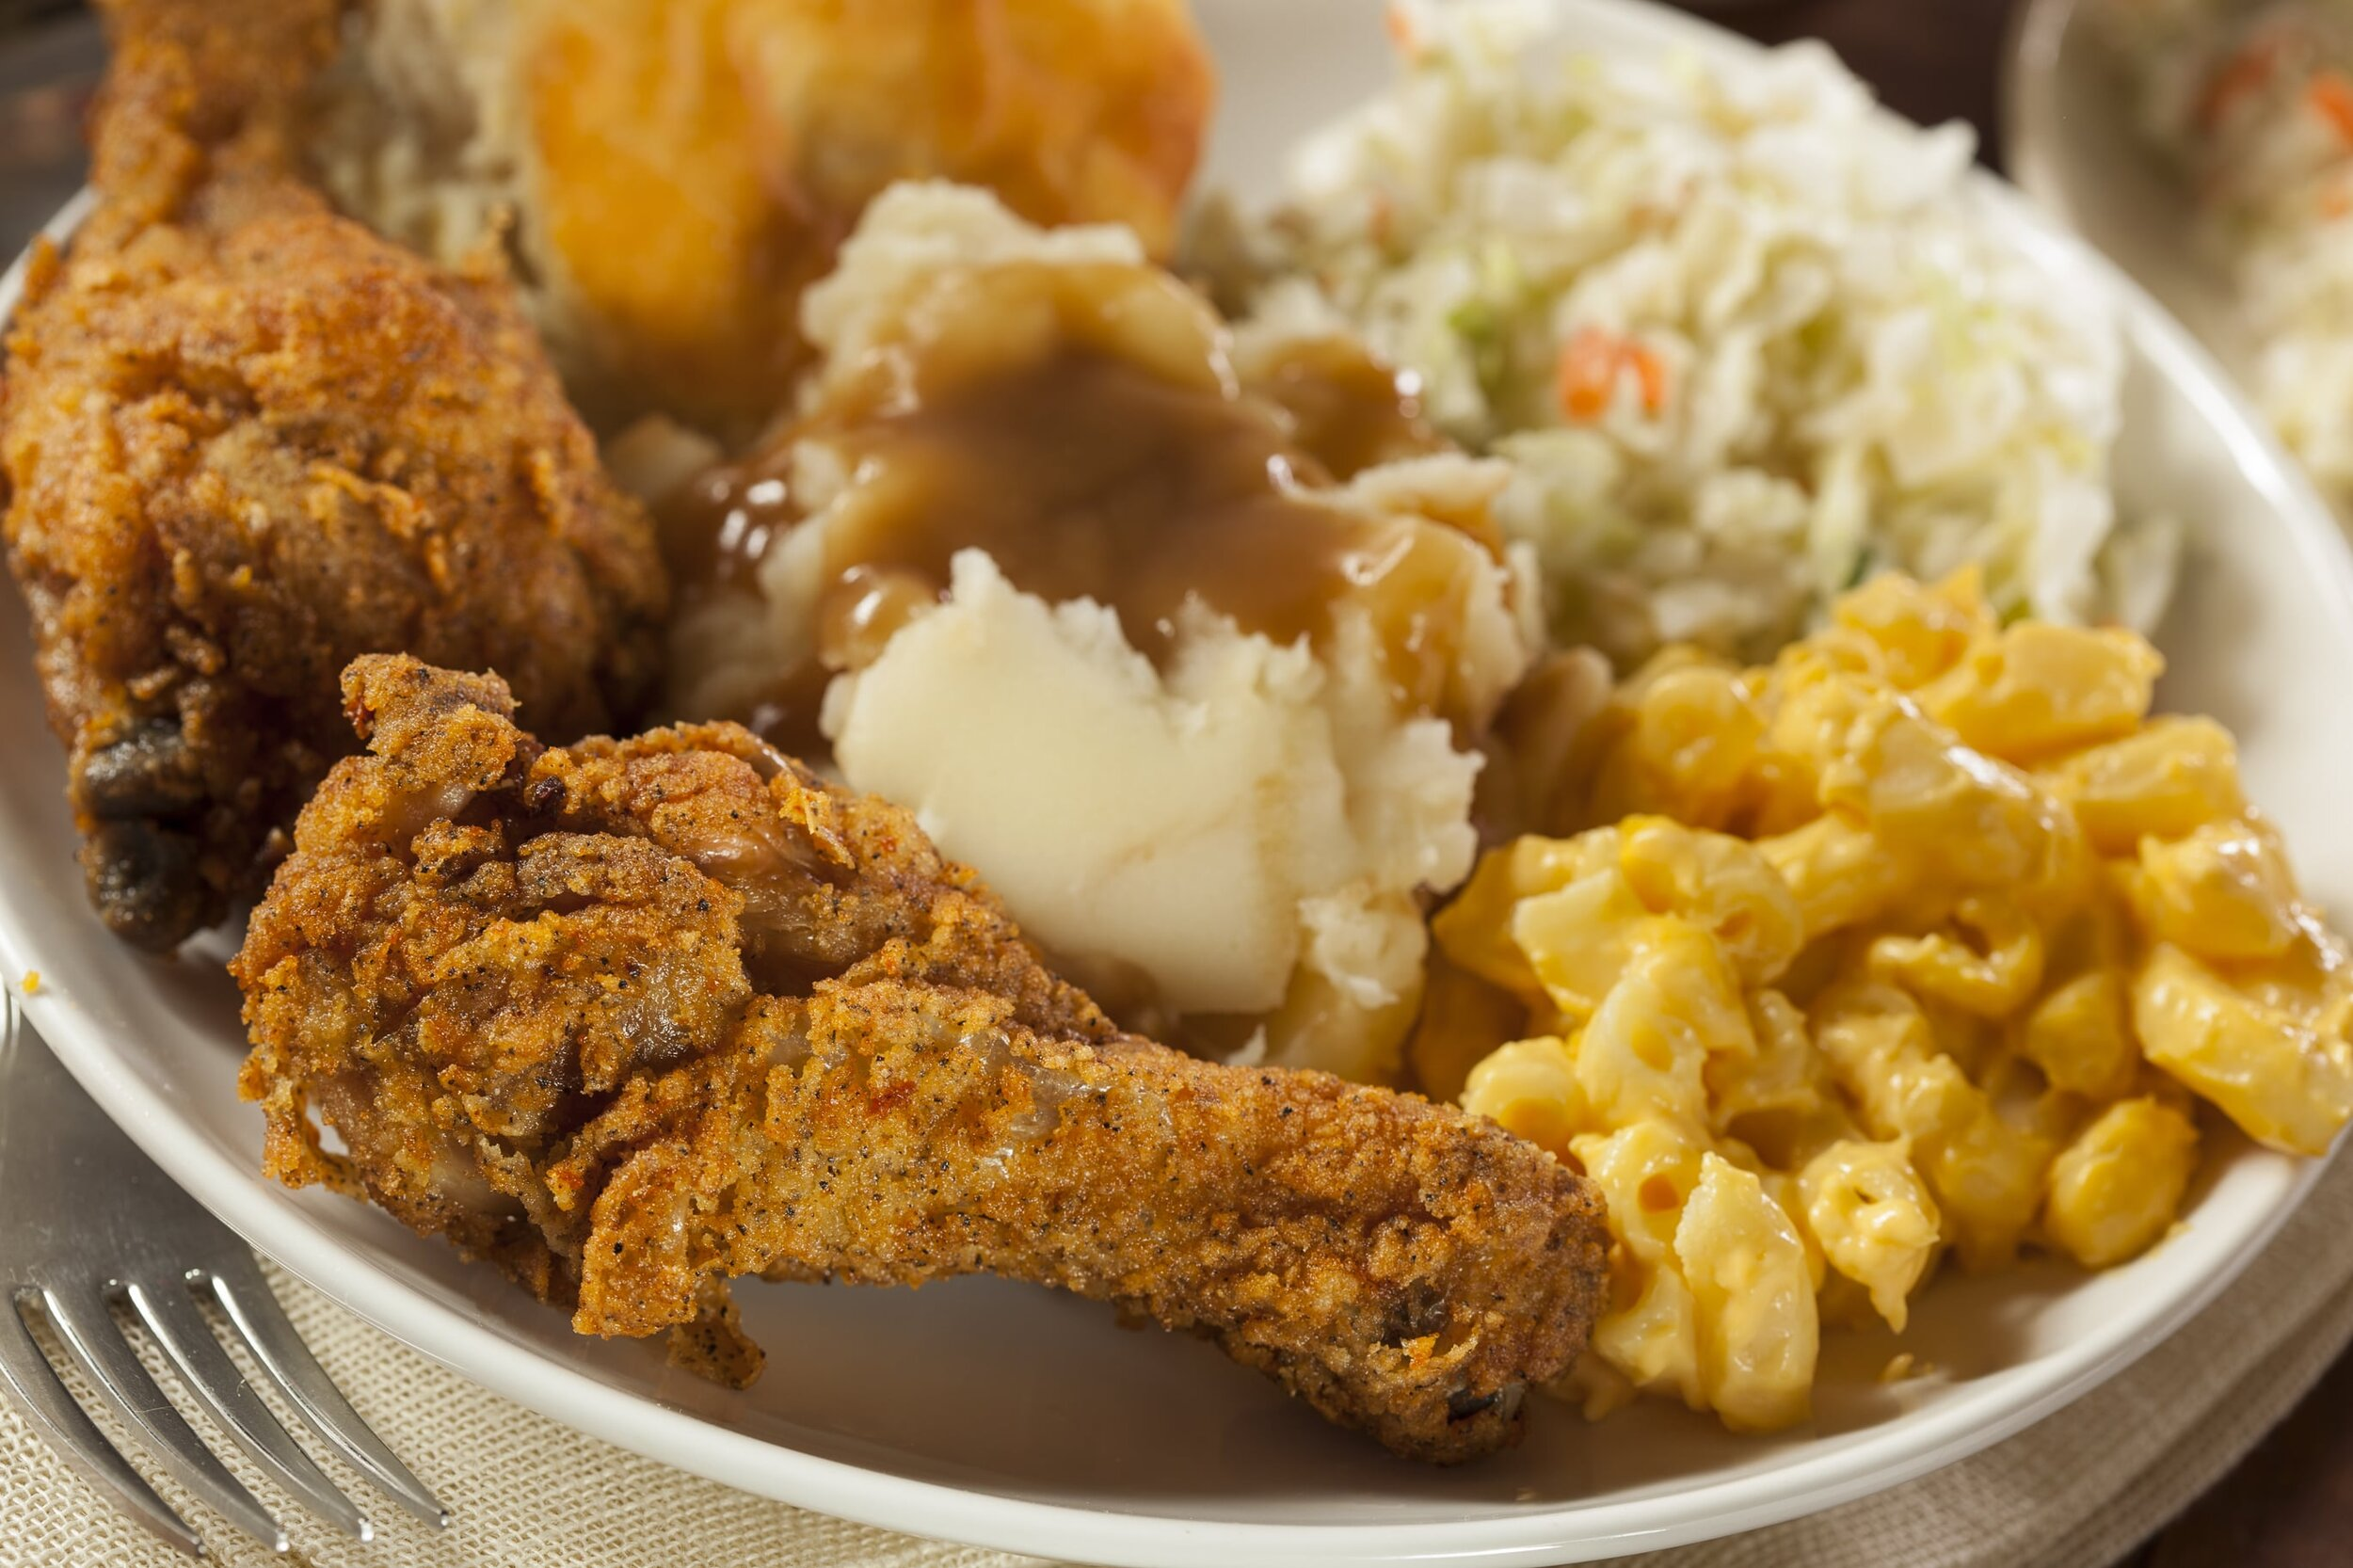 Fried chicken is a local's favorite in restaurants in Chapel Hill